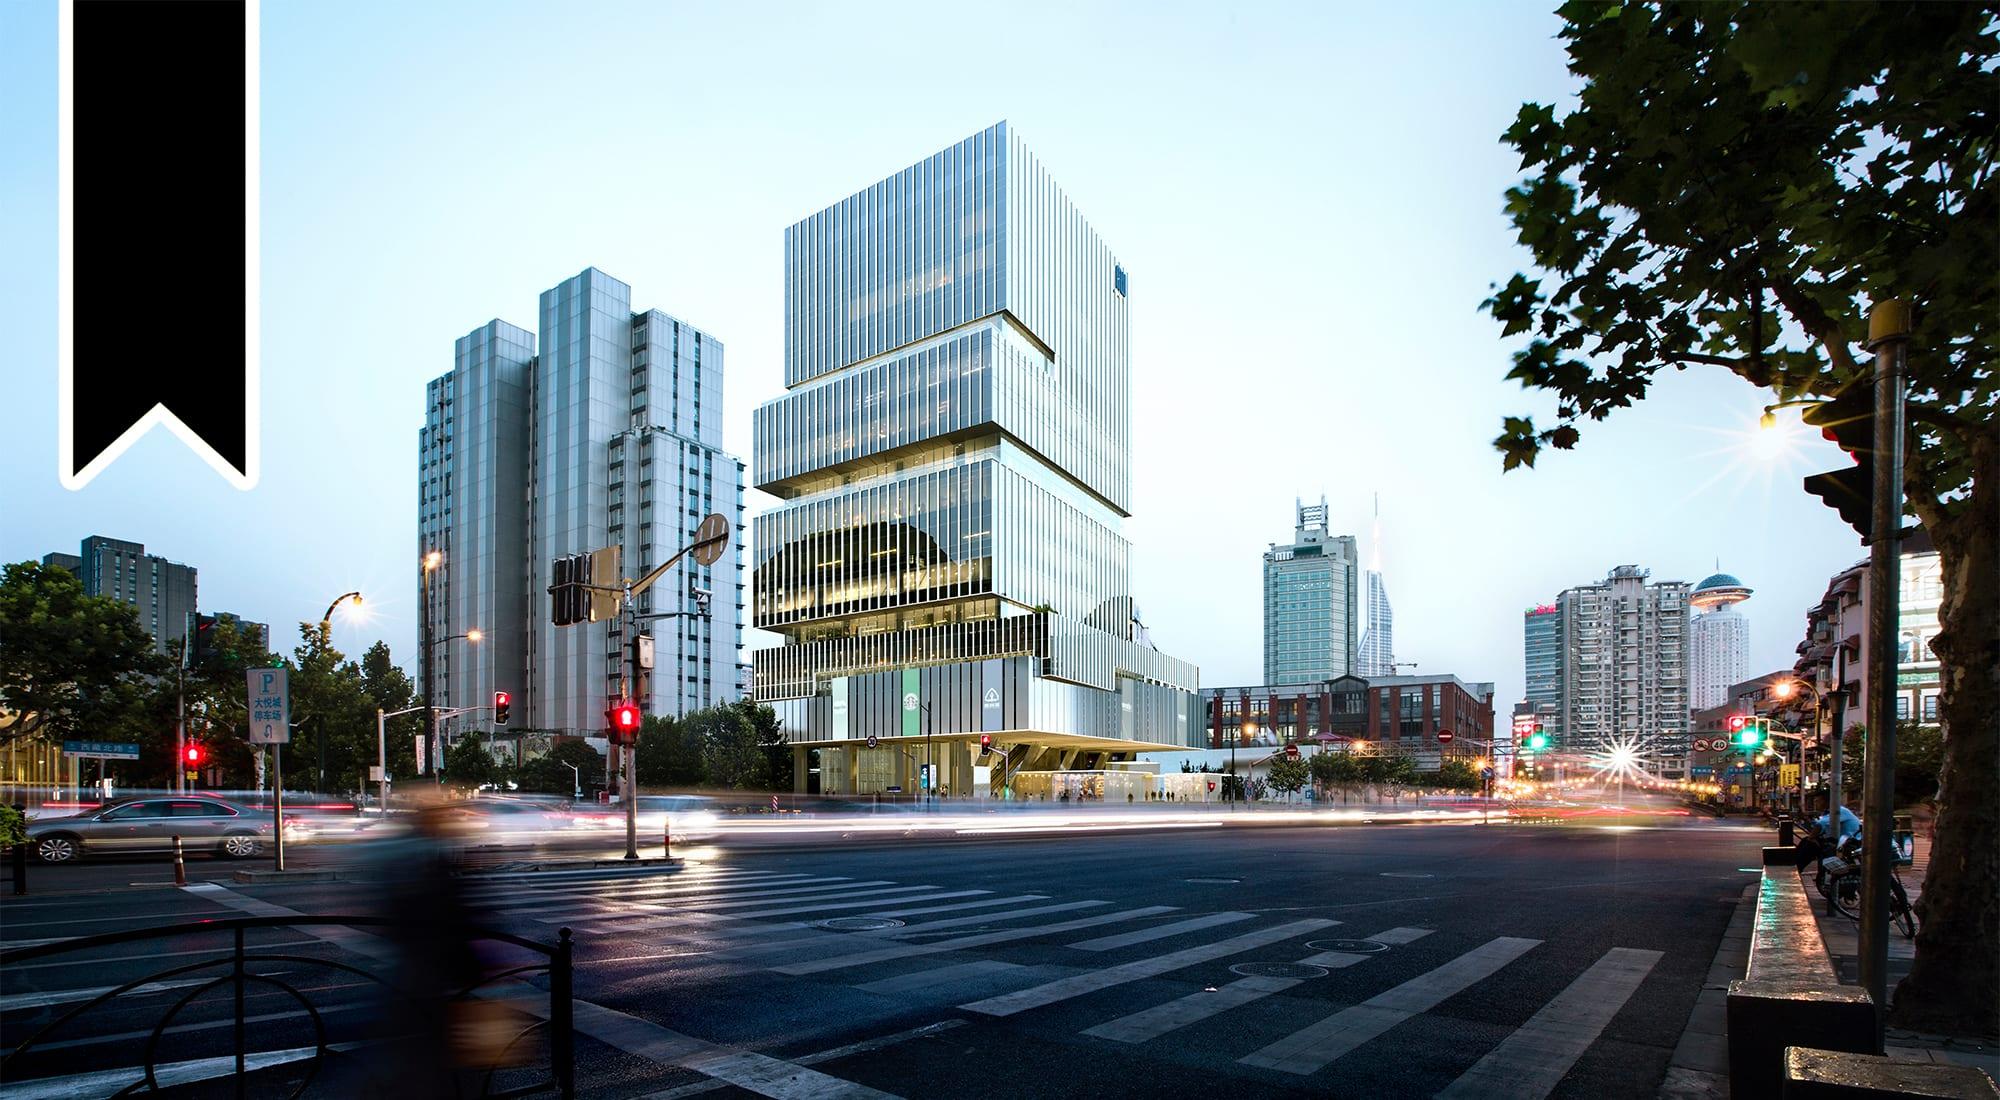 Aedas-Designed Shanghai Yingkai Cultural Plaza EDGE — Floating Garden Amidst Modernity